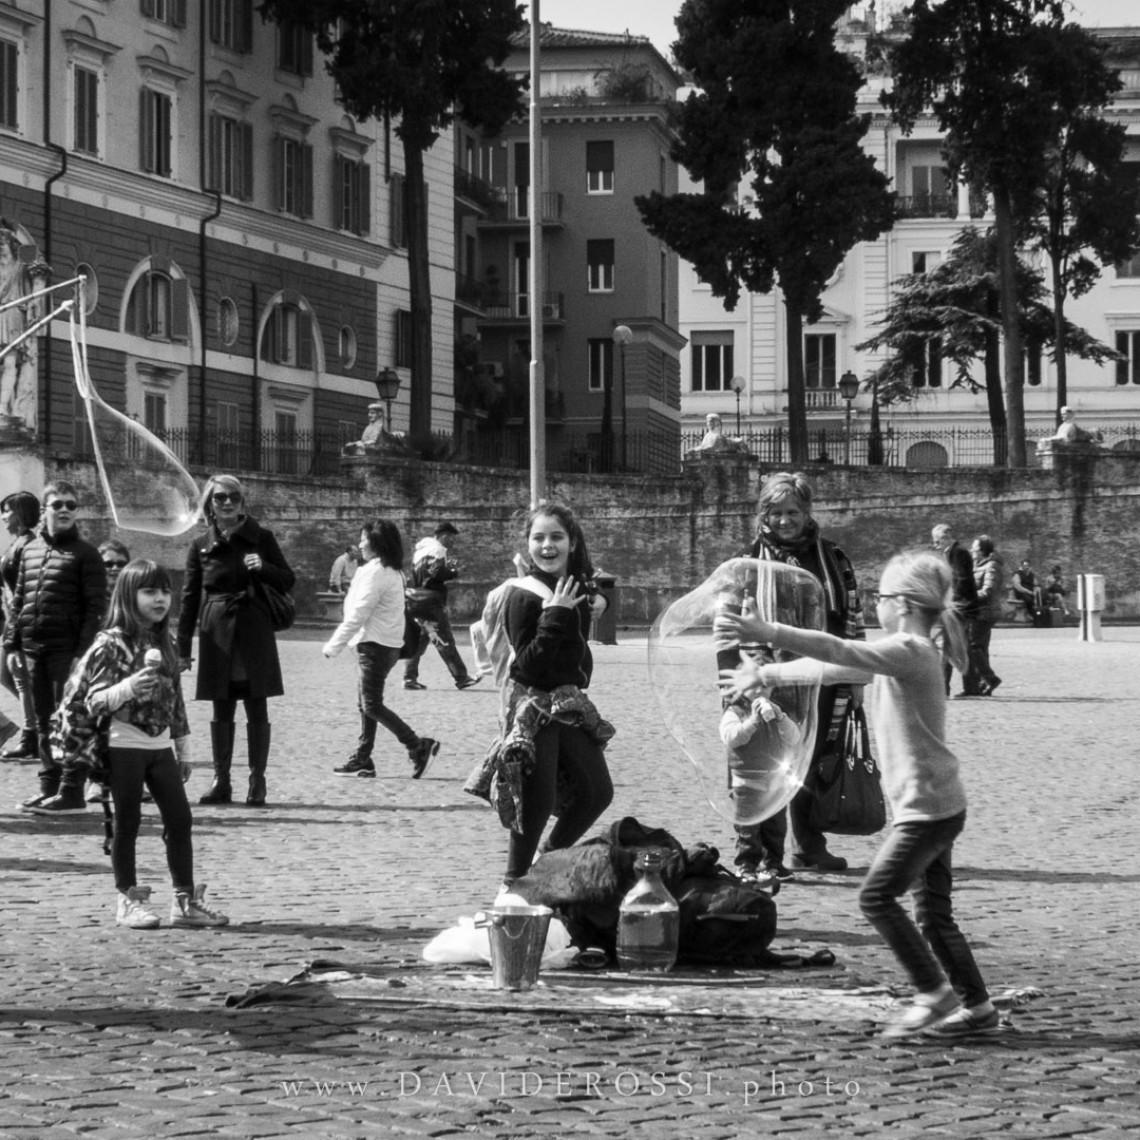 Bolle di sapone / Allegria in piazza